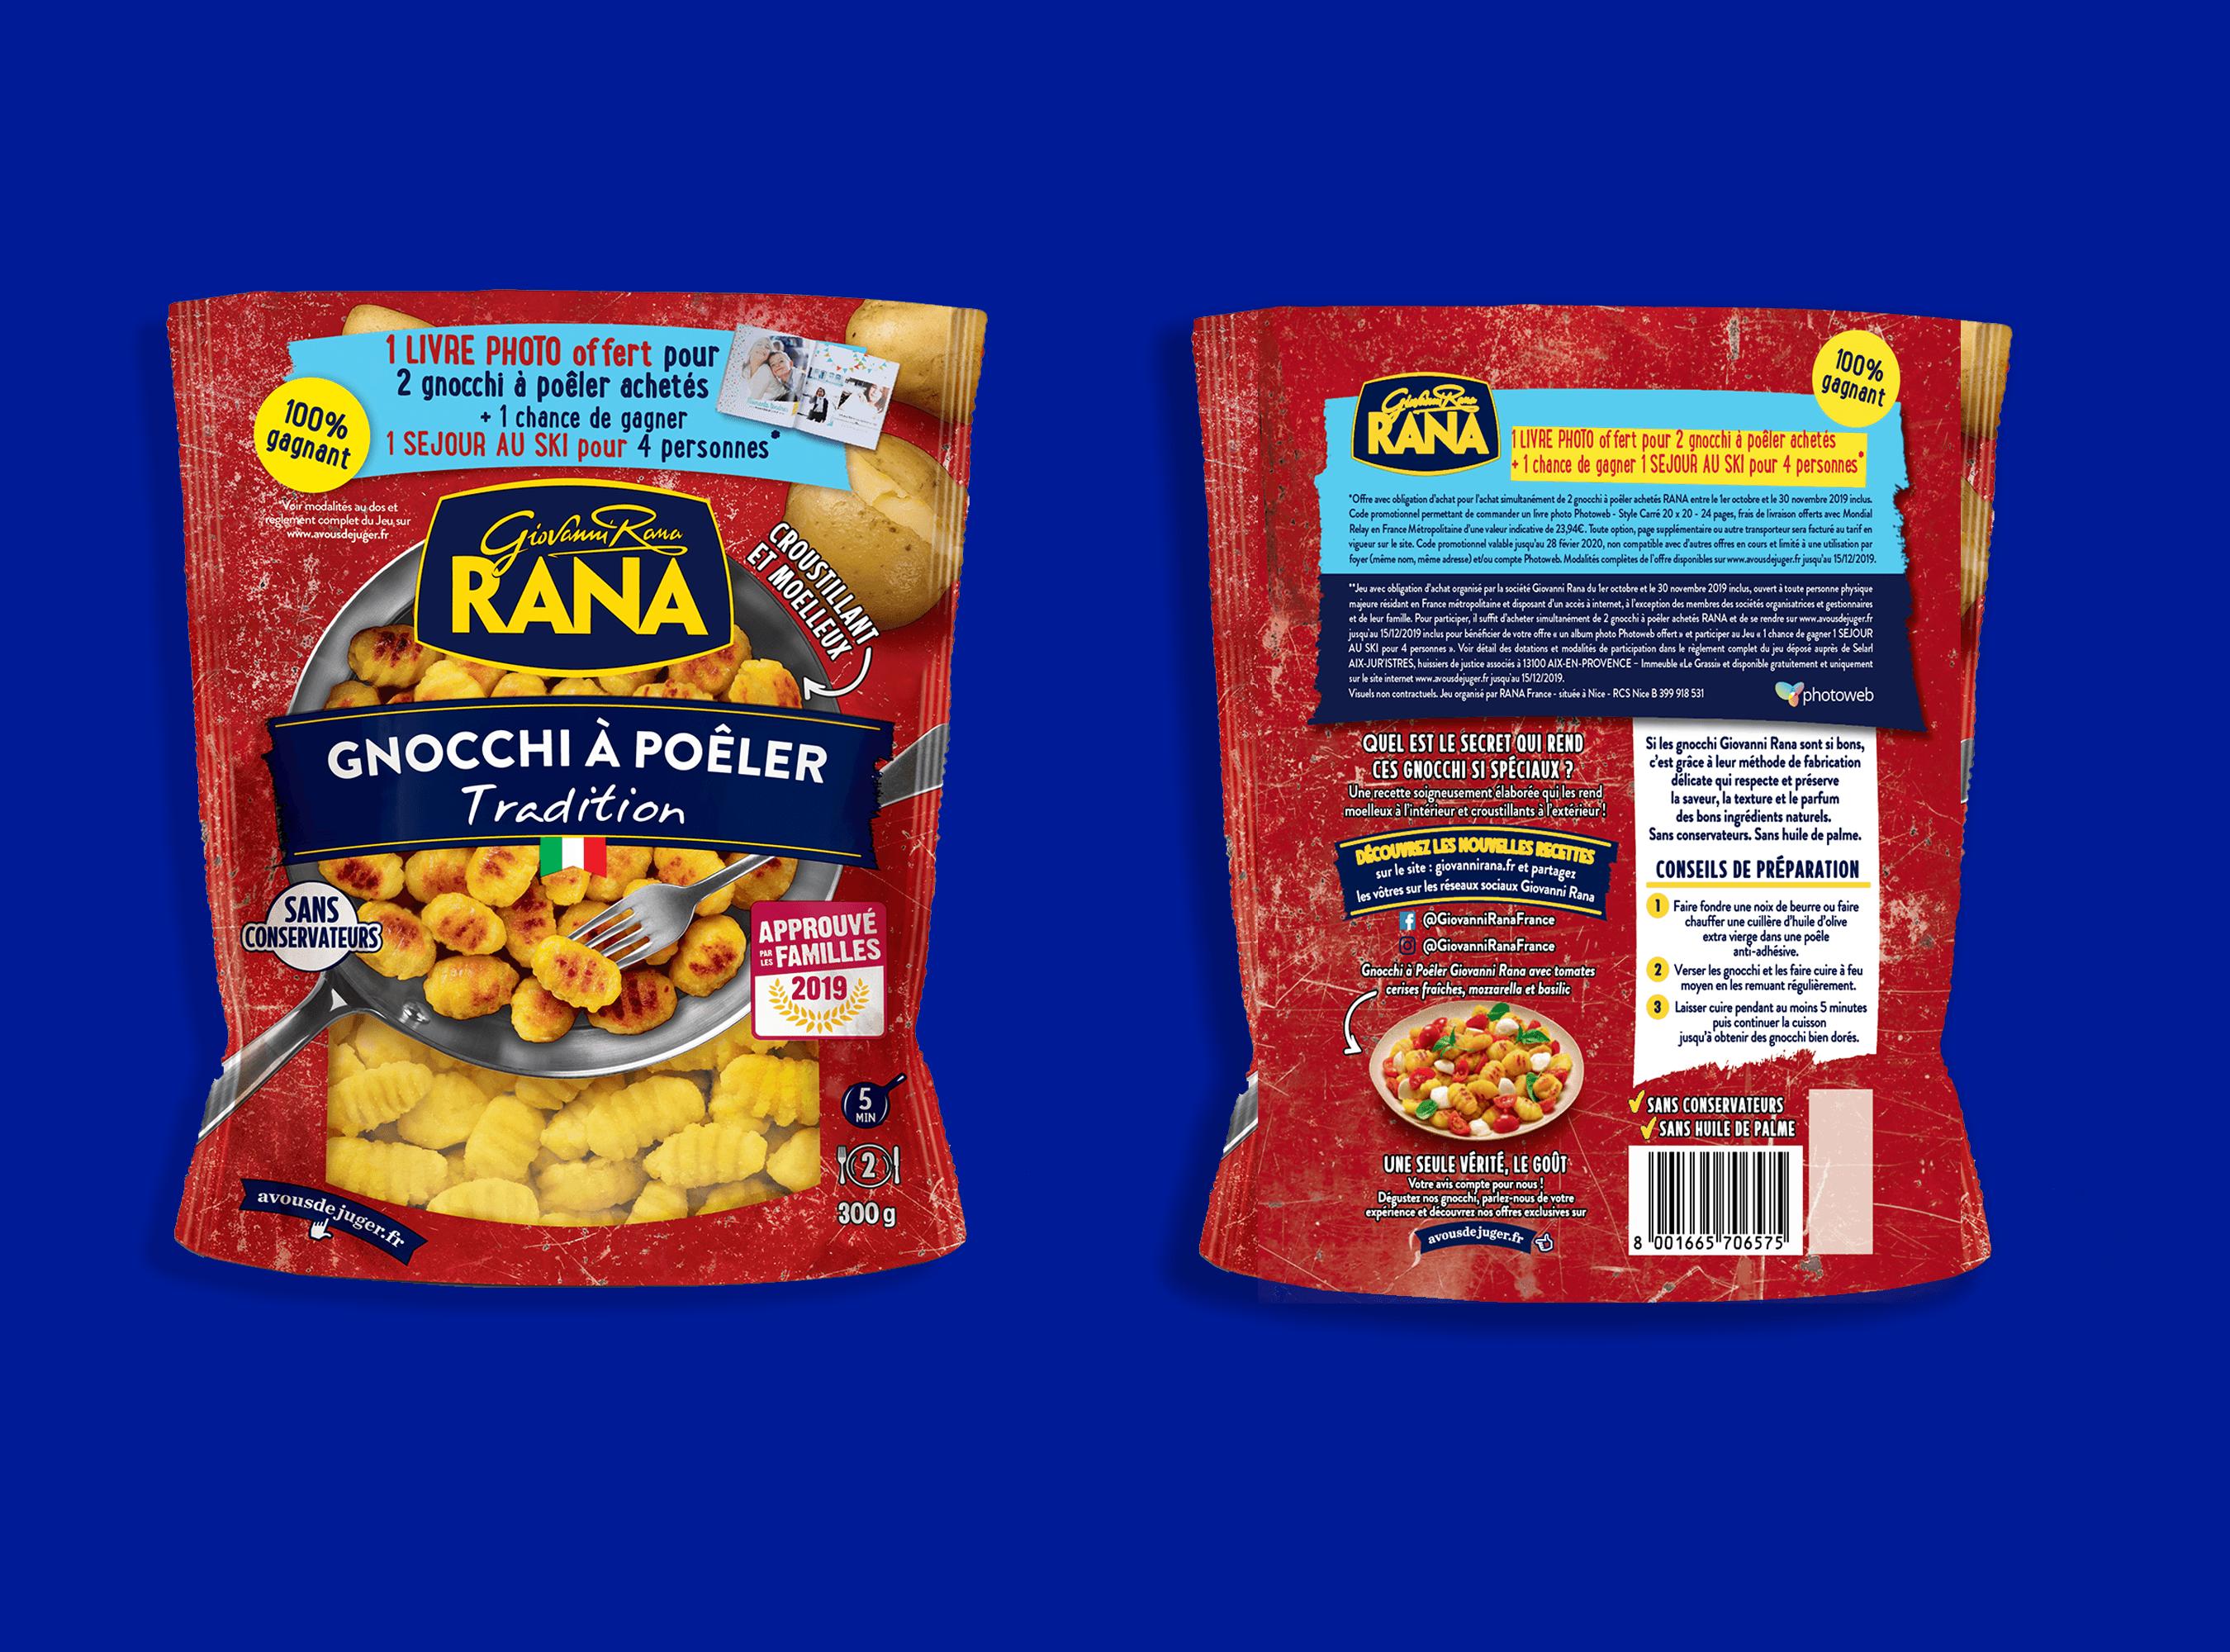 Giovanni Rana packaging